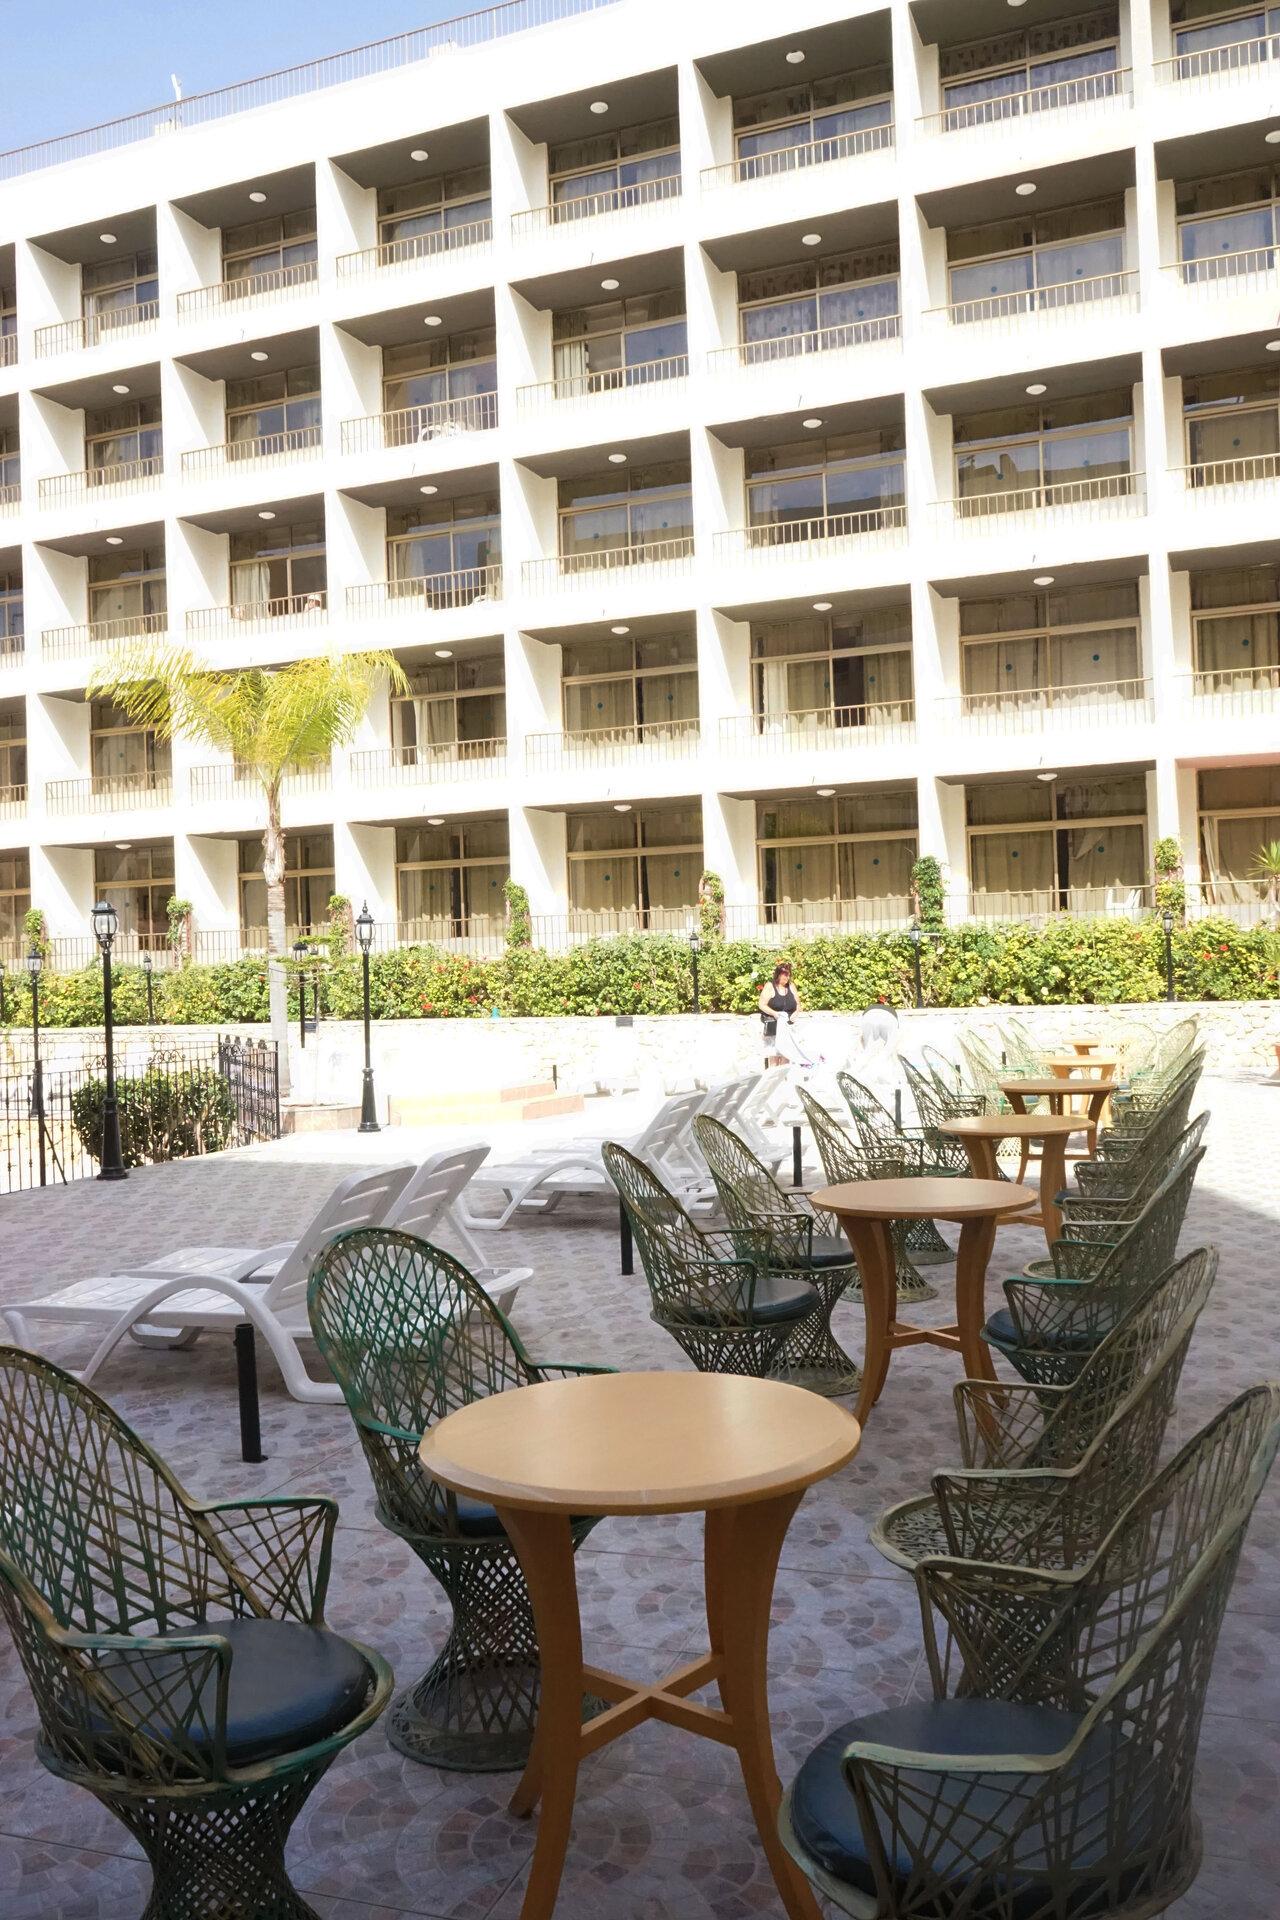 The Santa Maria Hotel